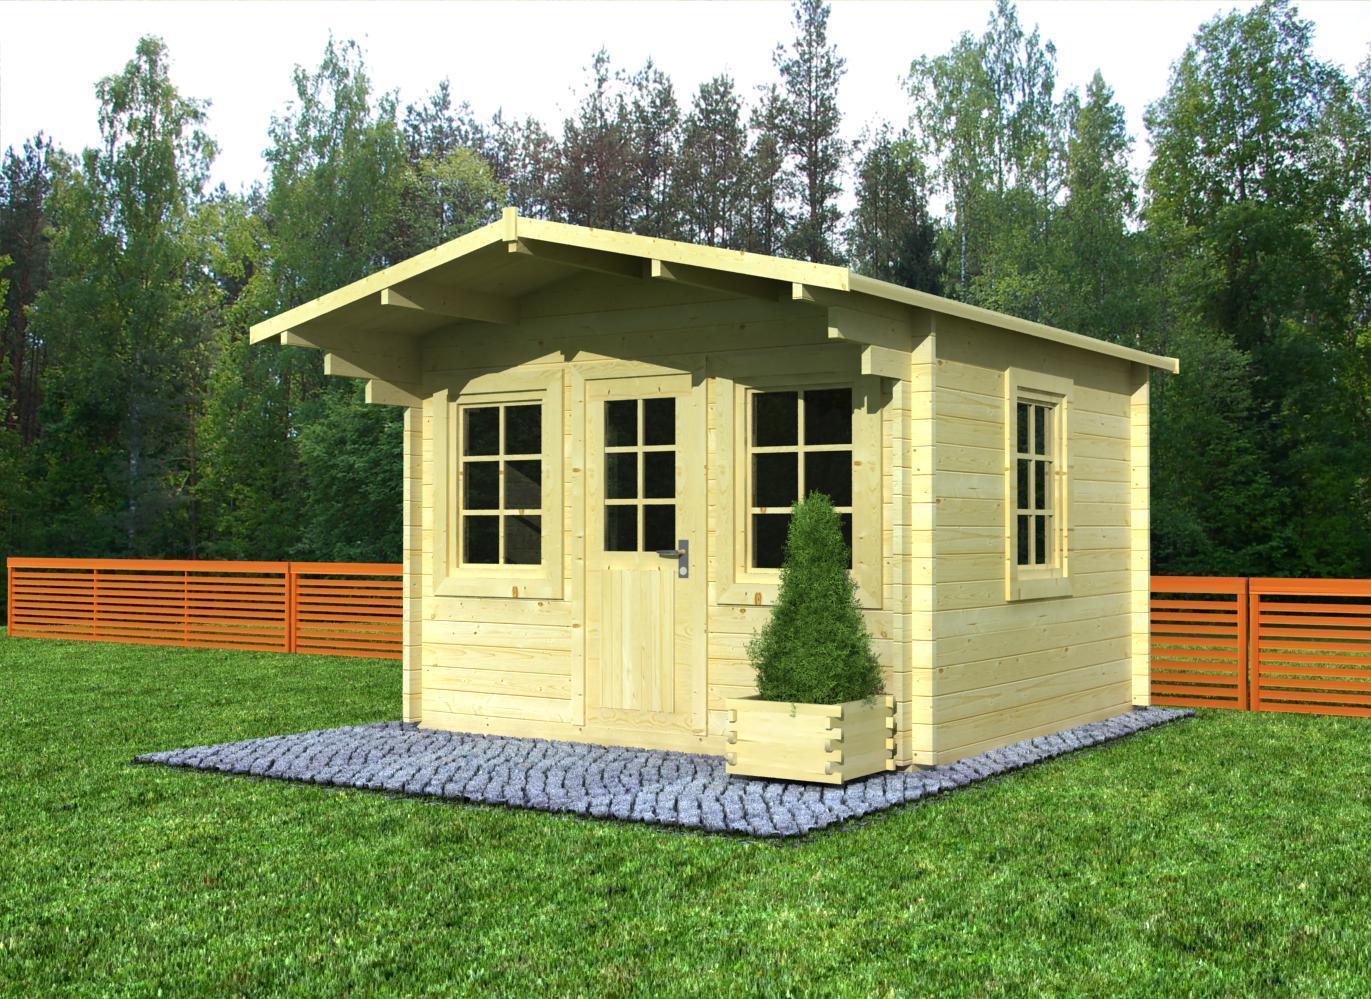 gartenhaus modell flensburg 28 sams gartenhaus shop. Black Bedroom Furniture Sets. Home Design Ideas